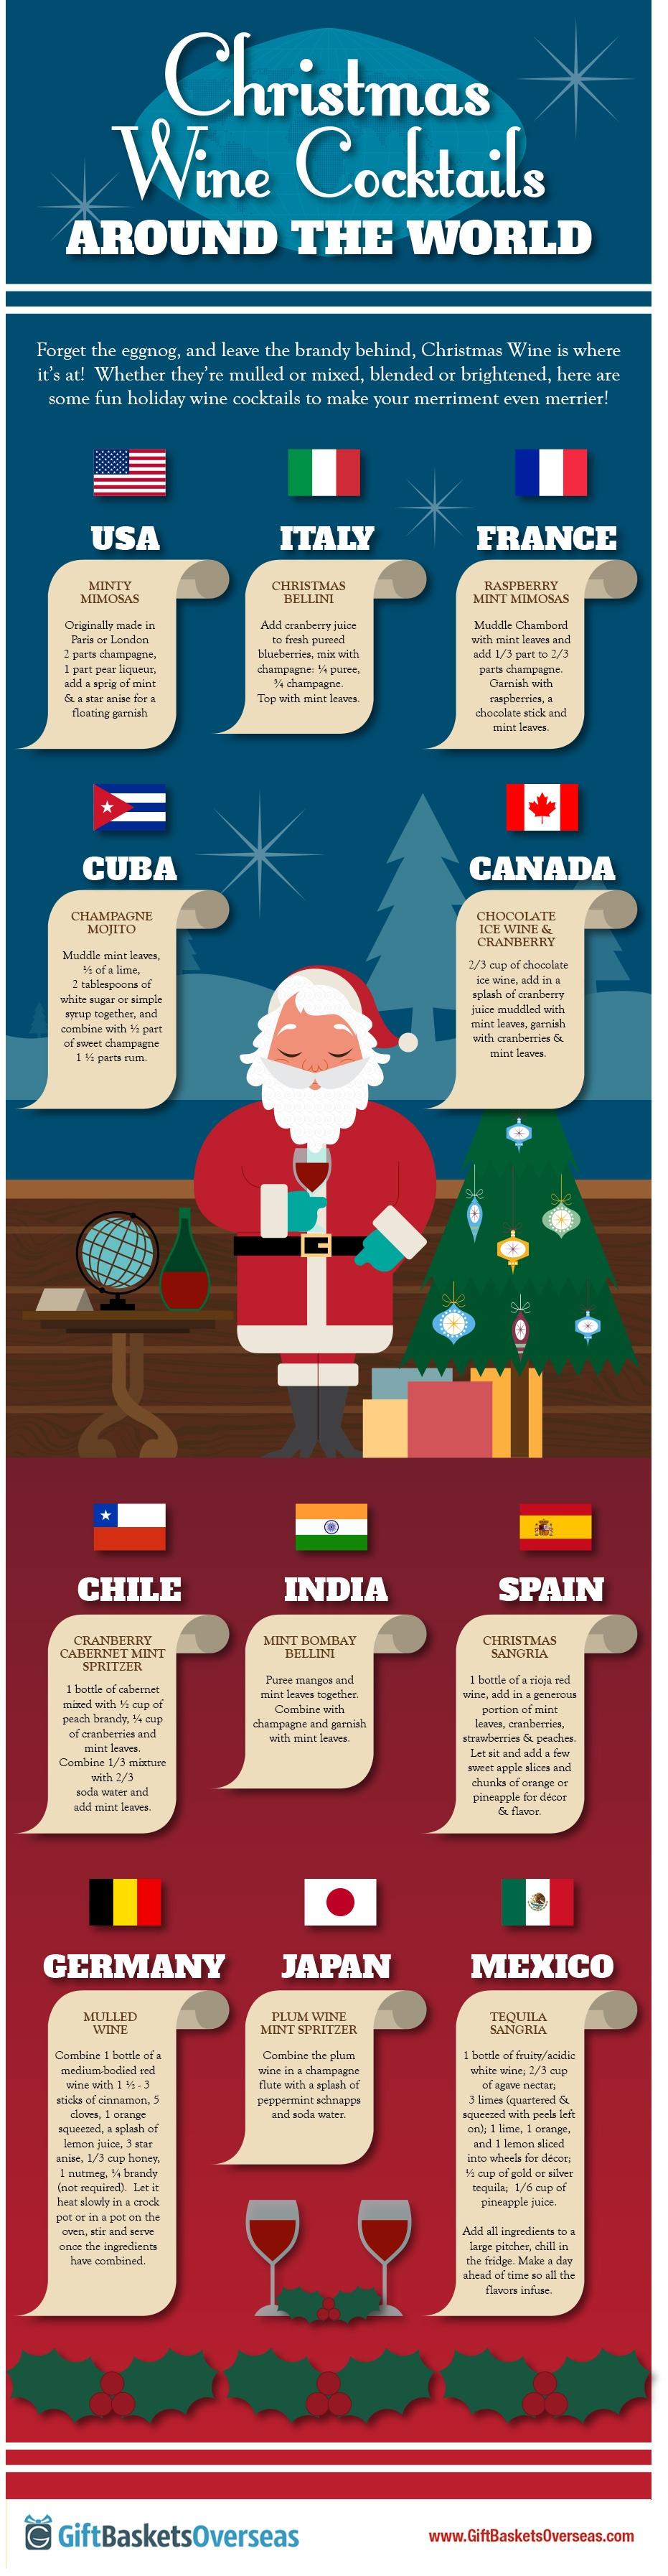 Christmas Wine Cocktails Around the World